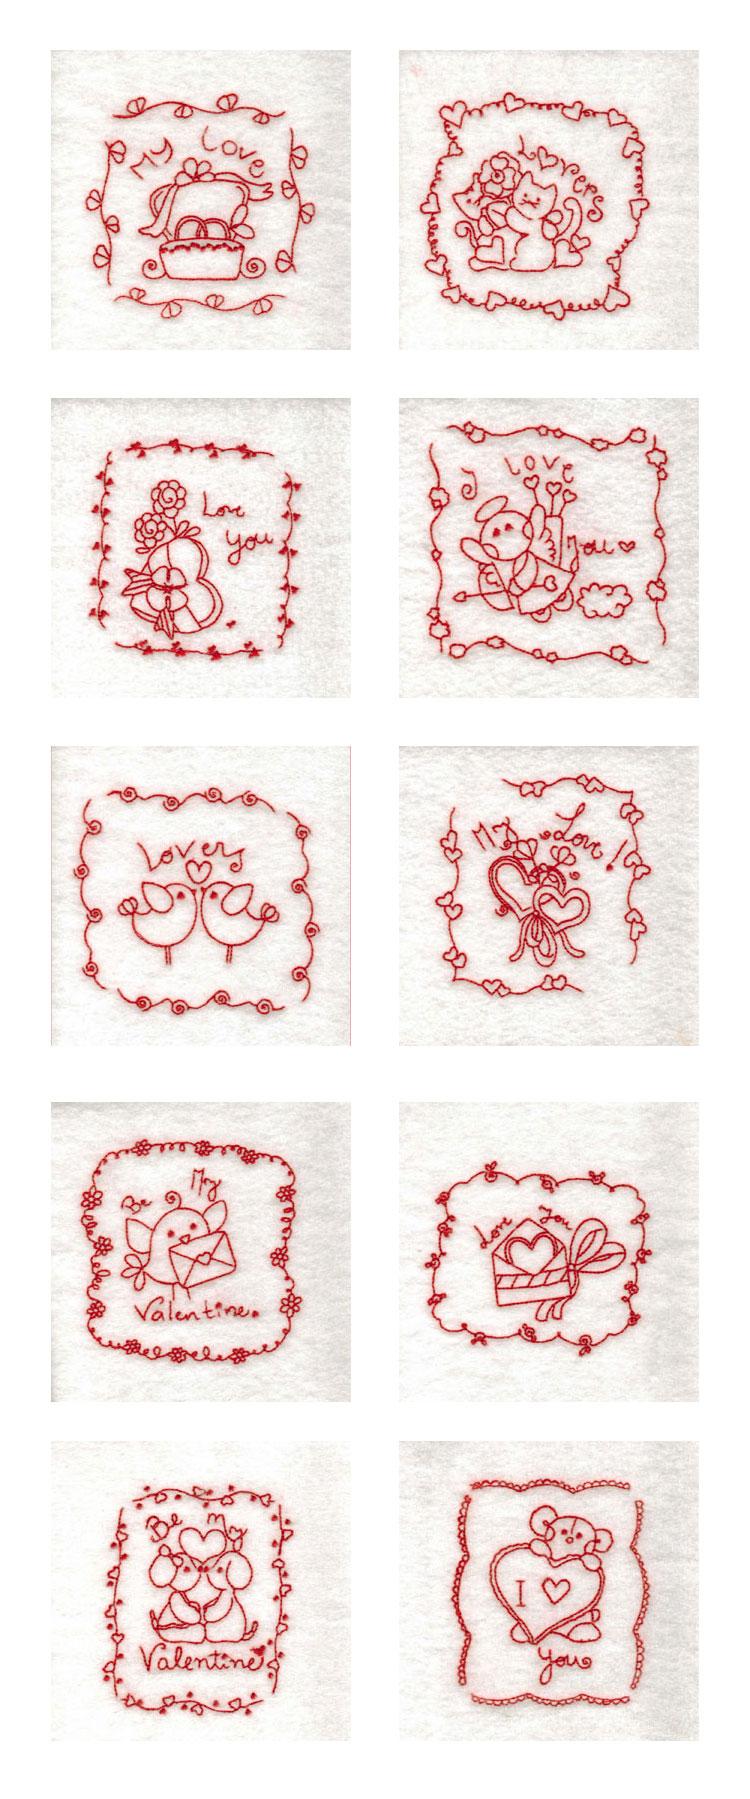 Machine embroidery designs rw valentine blocks set